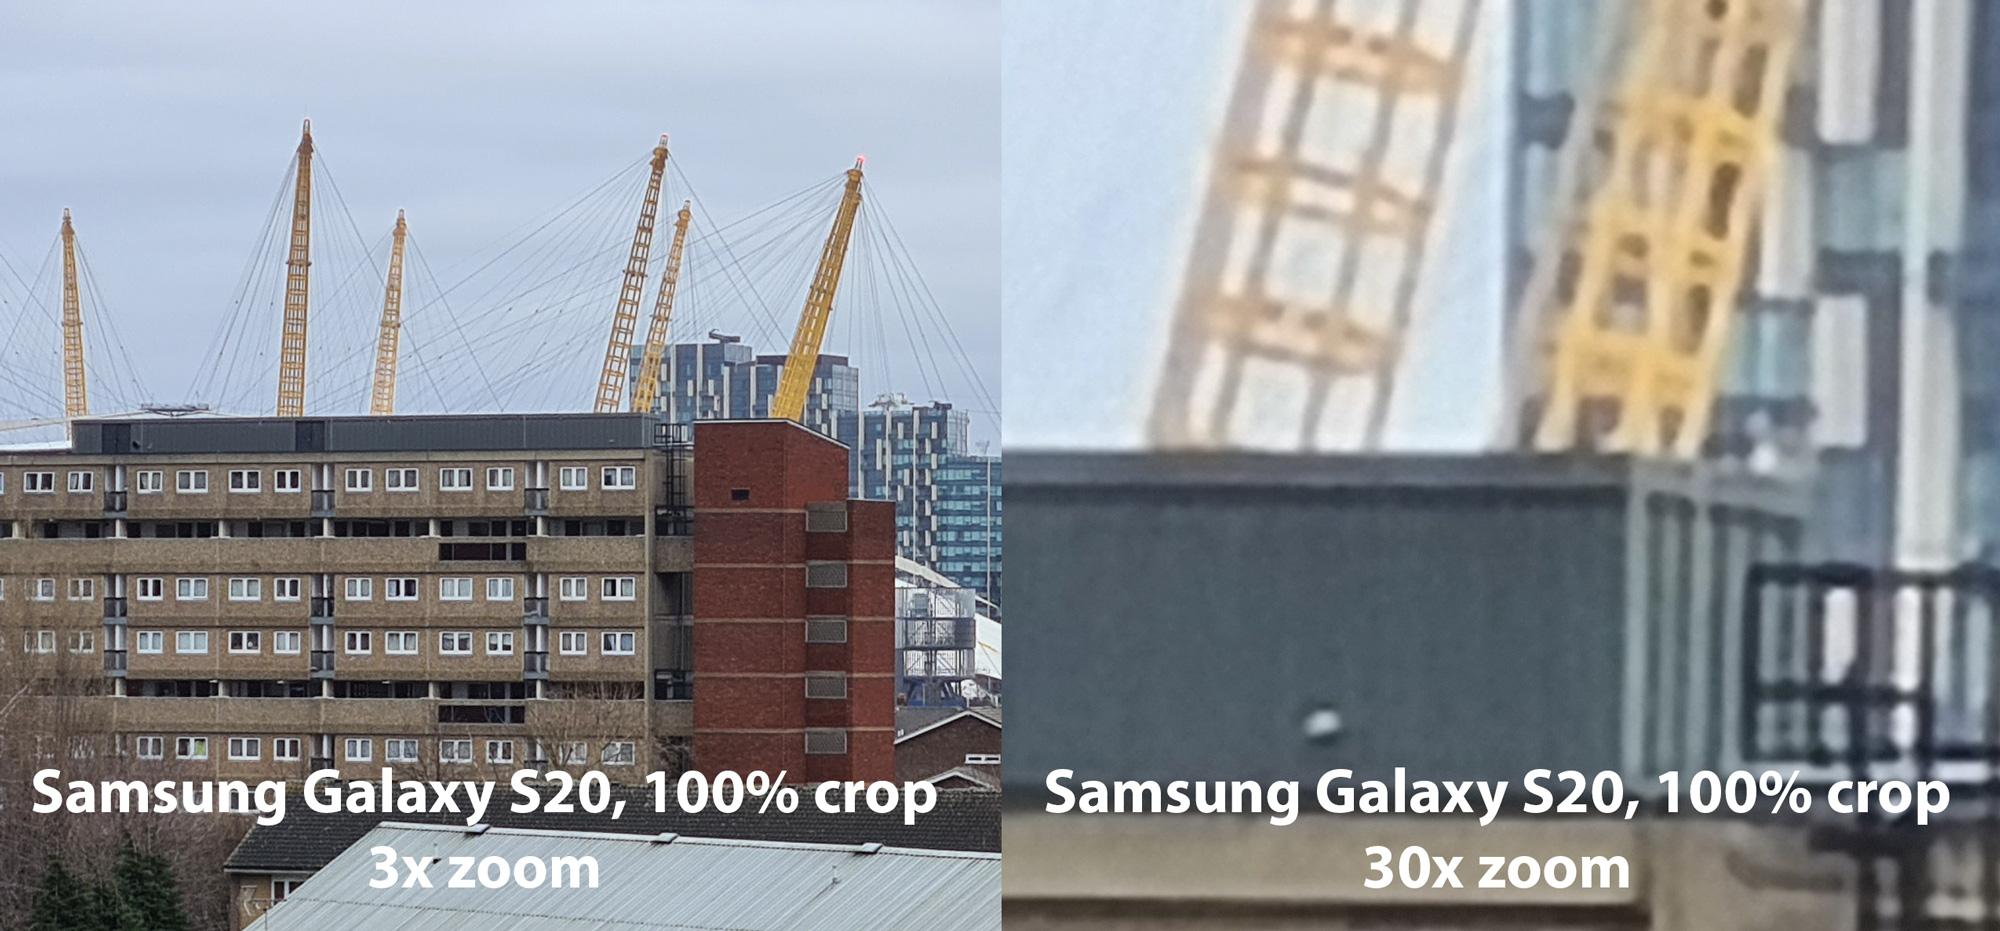 samsung-galaxy-s20-camera-comparison-zoom.jpg